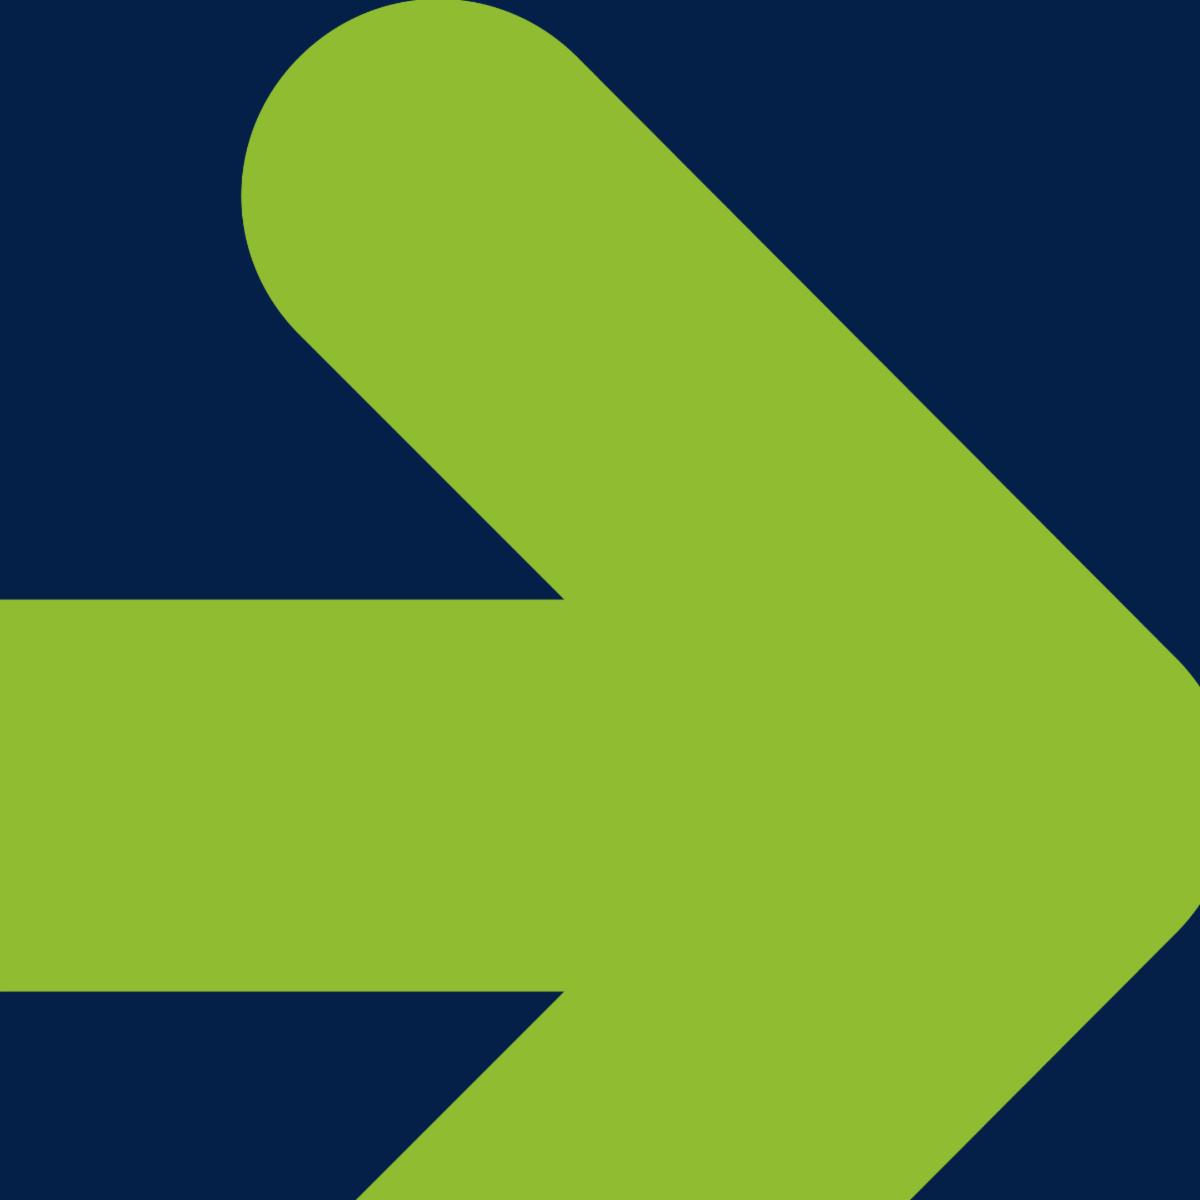 Green rightward facing arrow